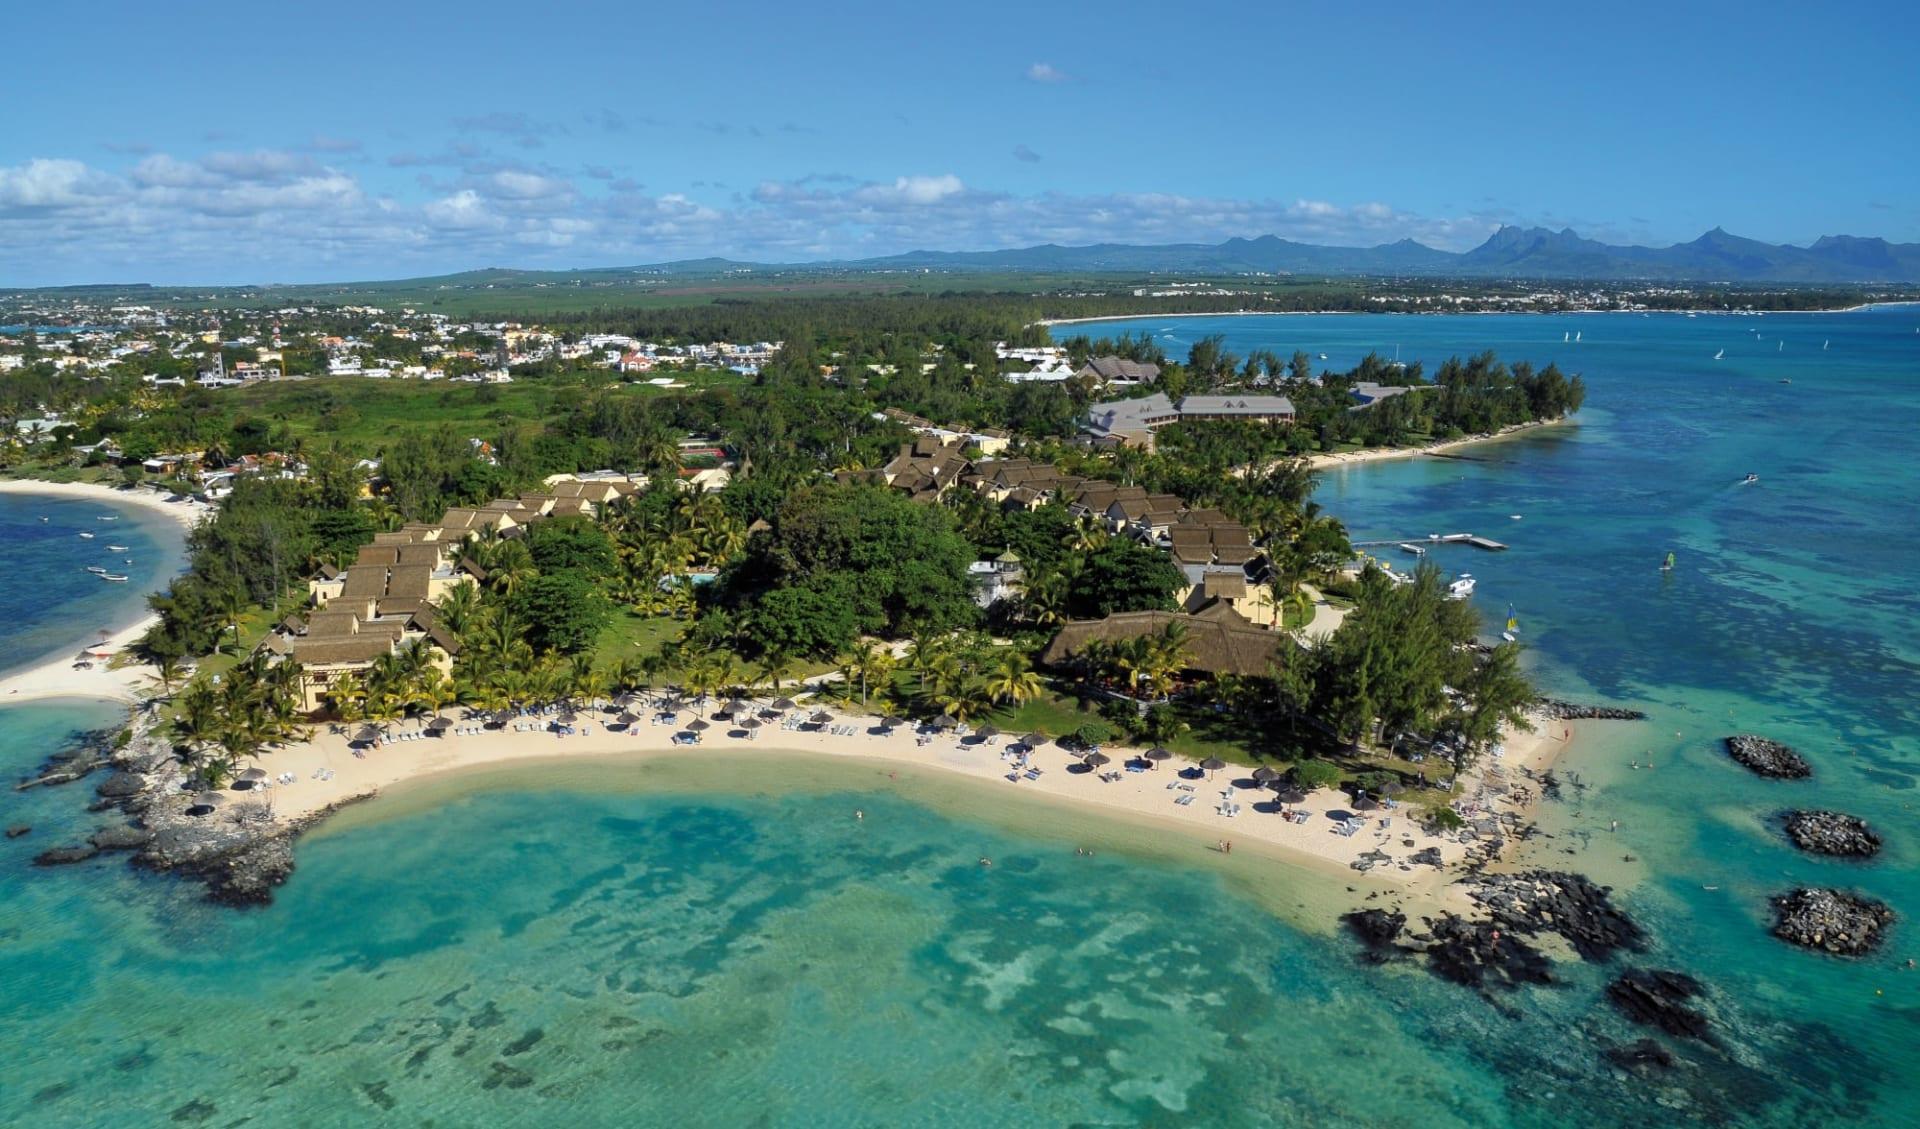 Canonnier Beachcomber Golf Resort & Spa in Pointe aux Canonniers: